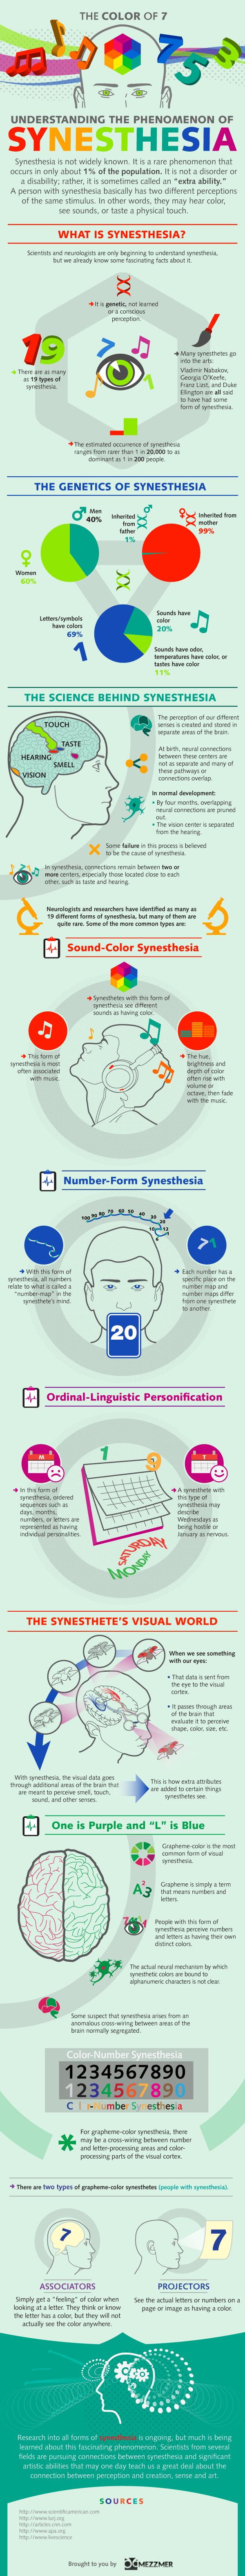 Synesthesia... a bit of advice?